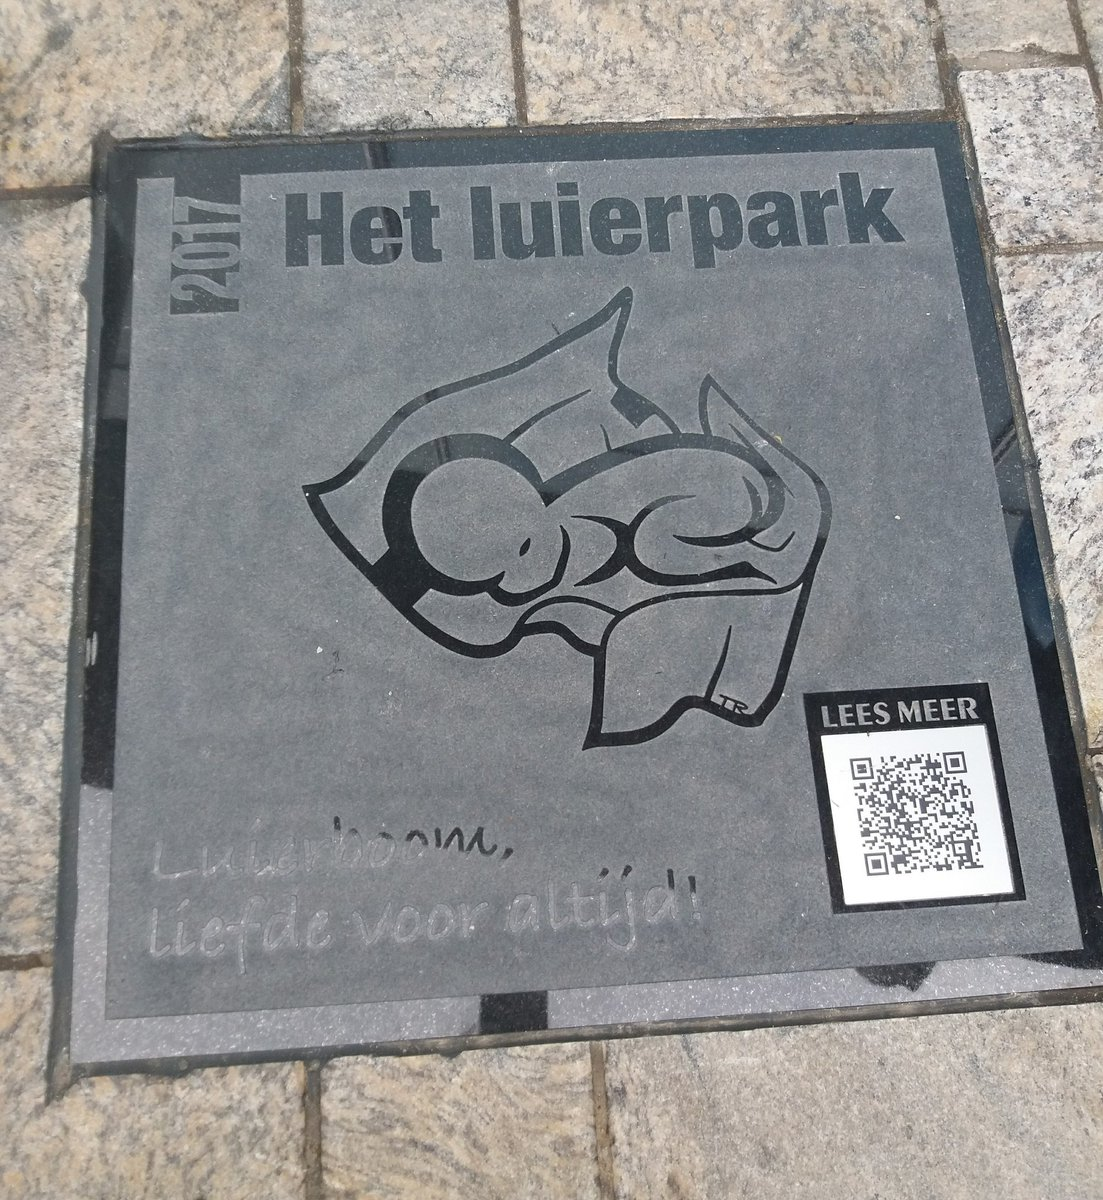 Franc M Weerwind On Twitter 44e Walk Of Fame Tegel Siert